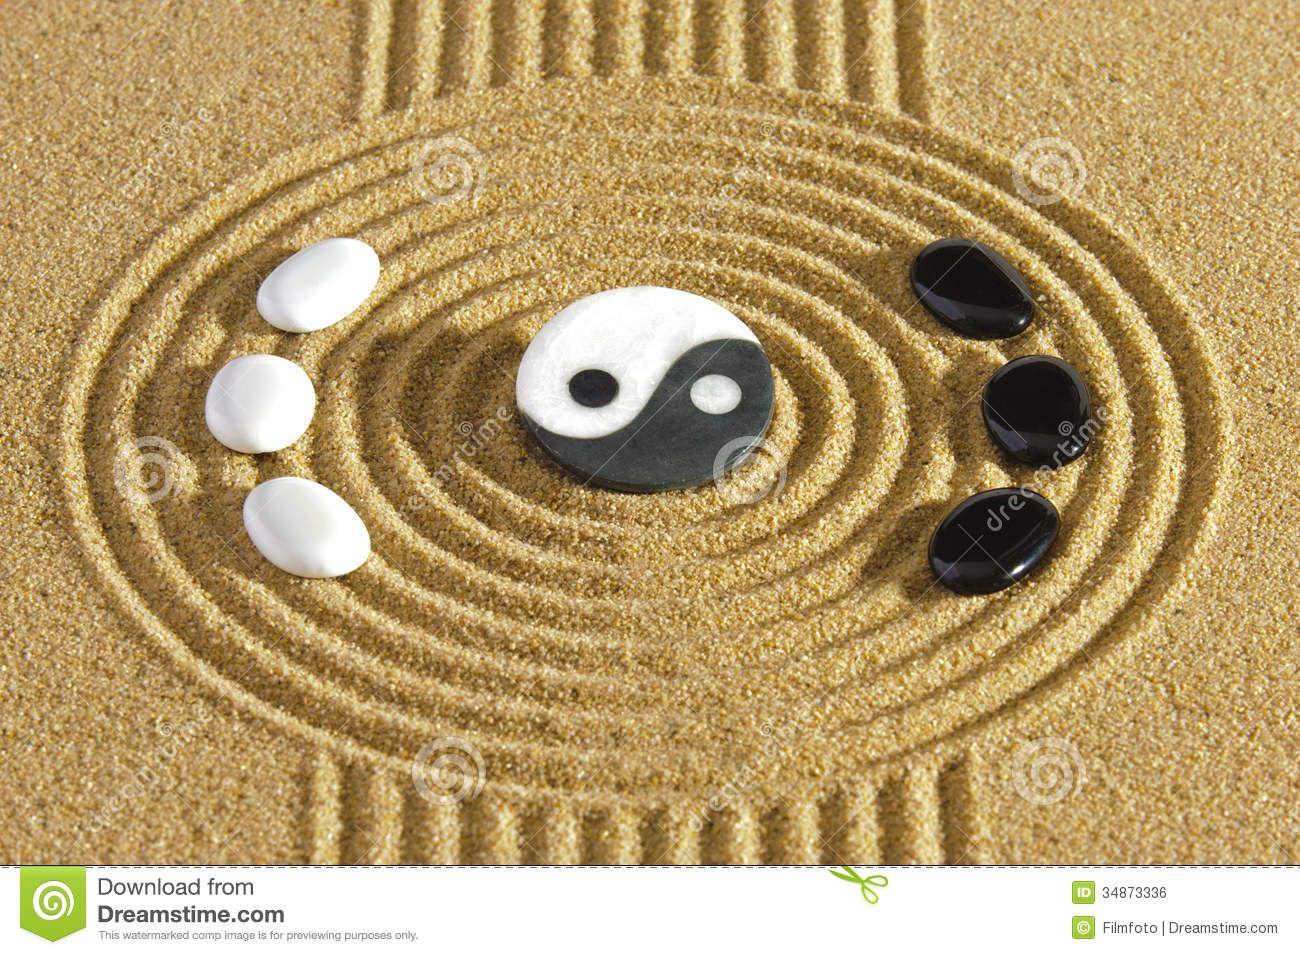 how to design a ying yang garden Japanese zen garden with stones